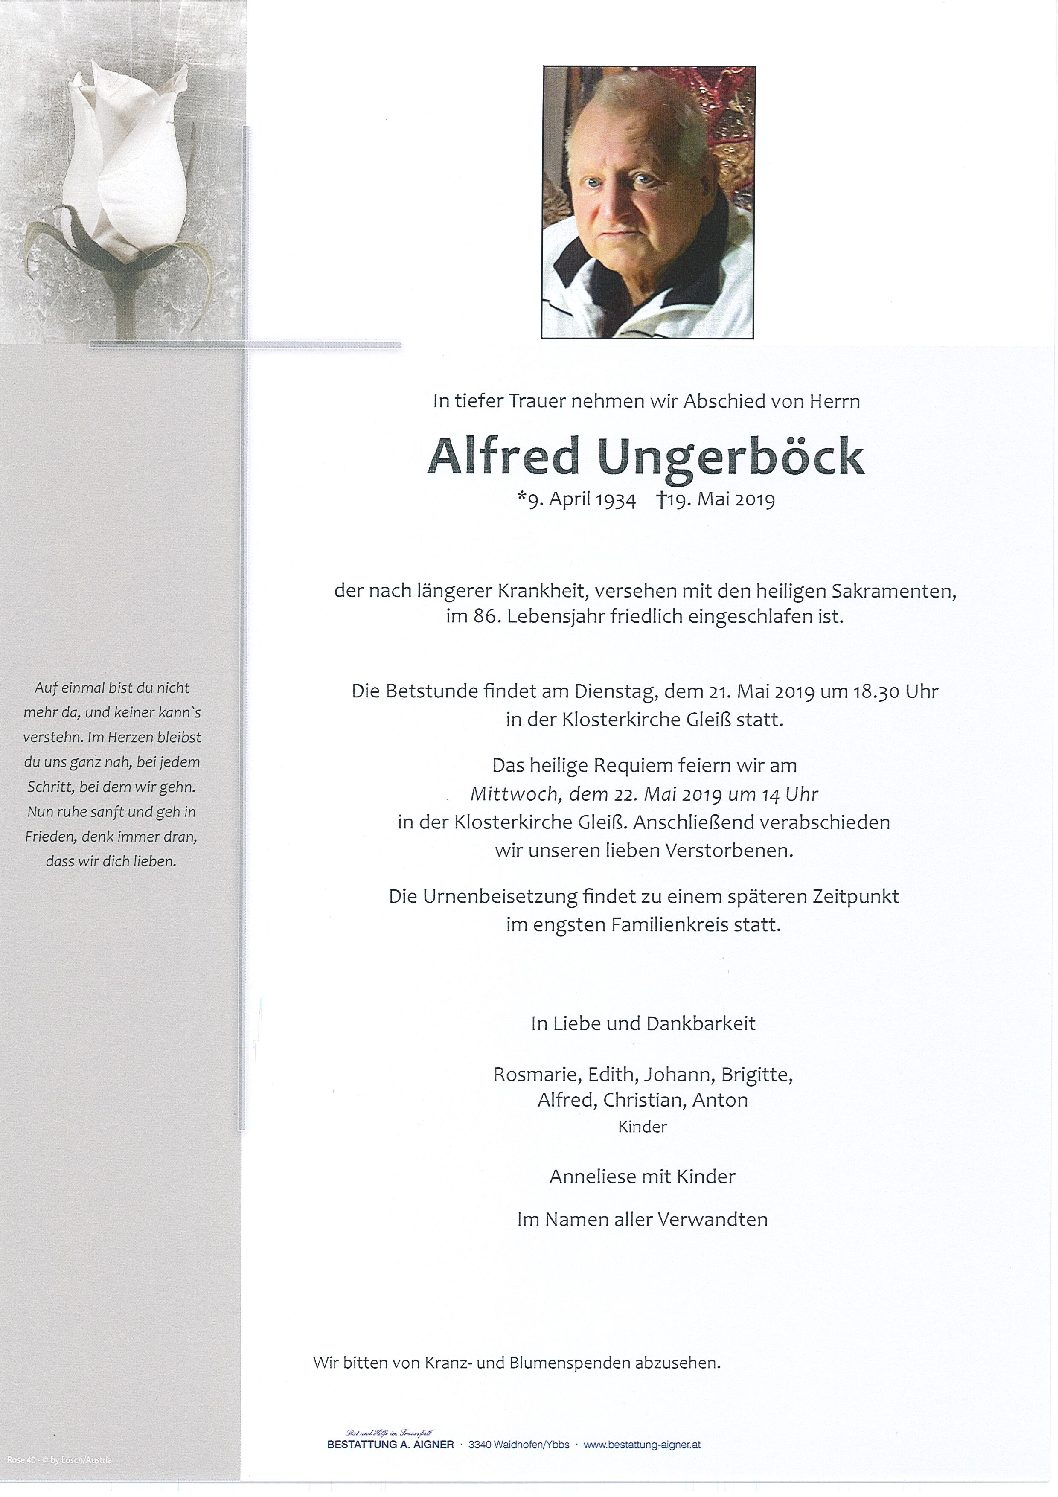 Alfred Ungerböck